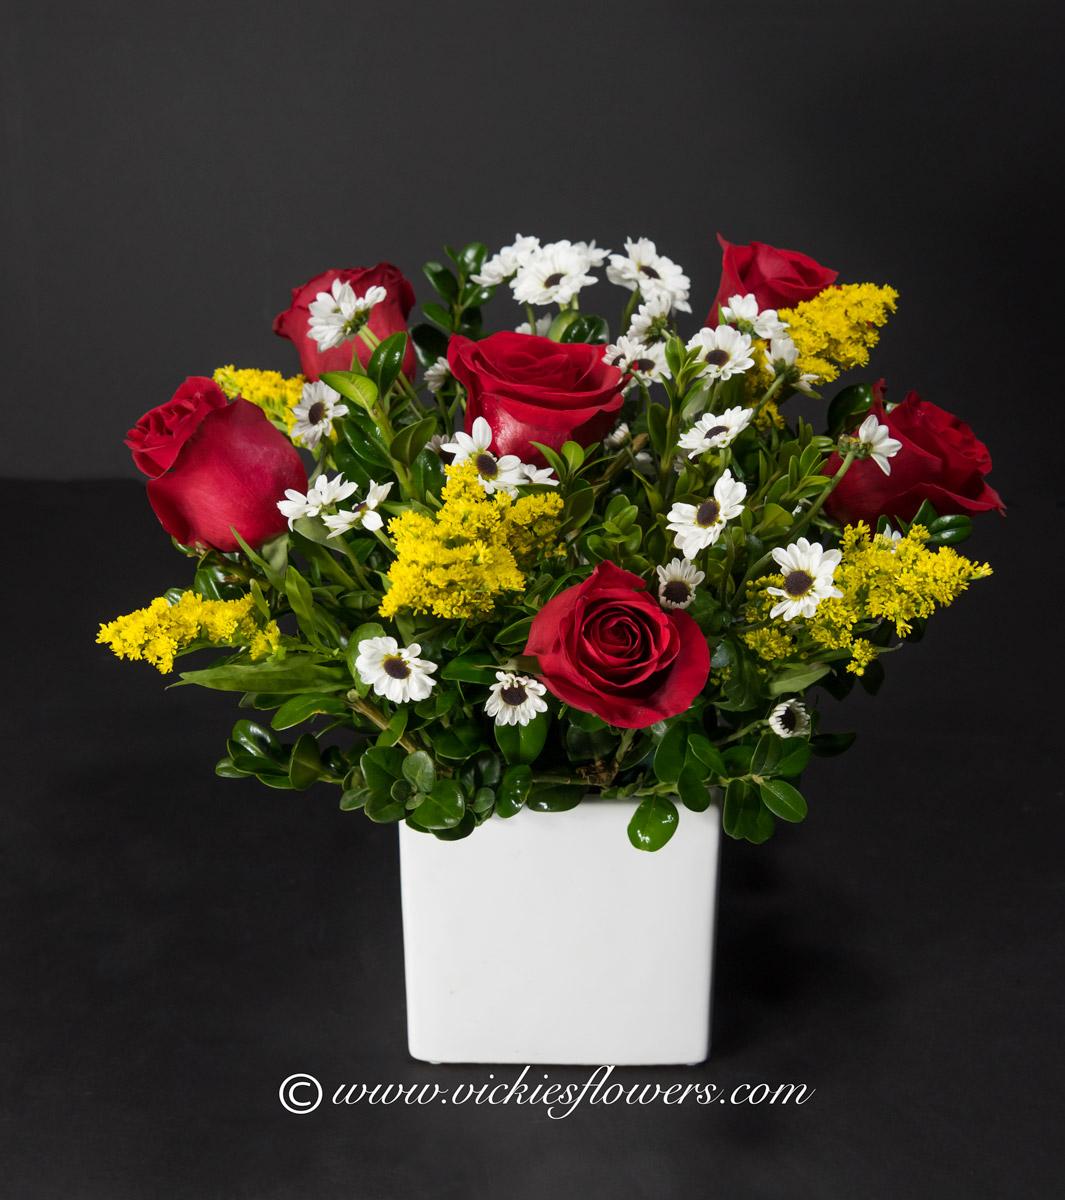 2019 Valentine's Day Flowers